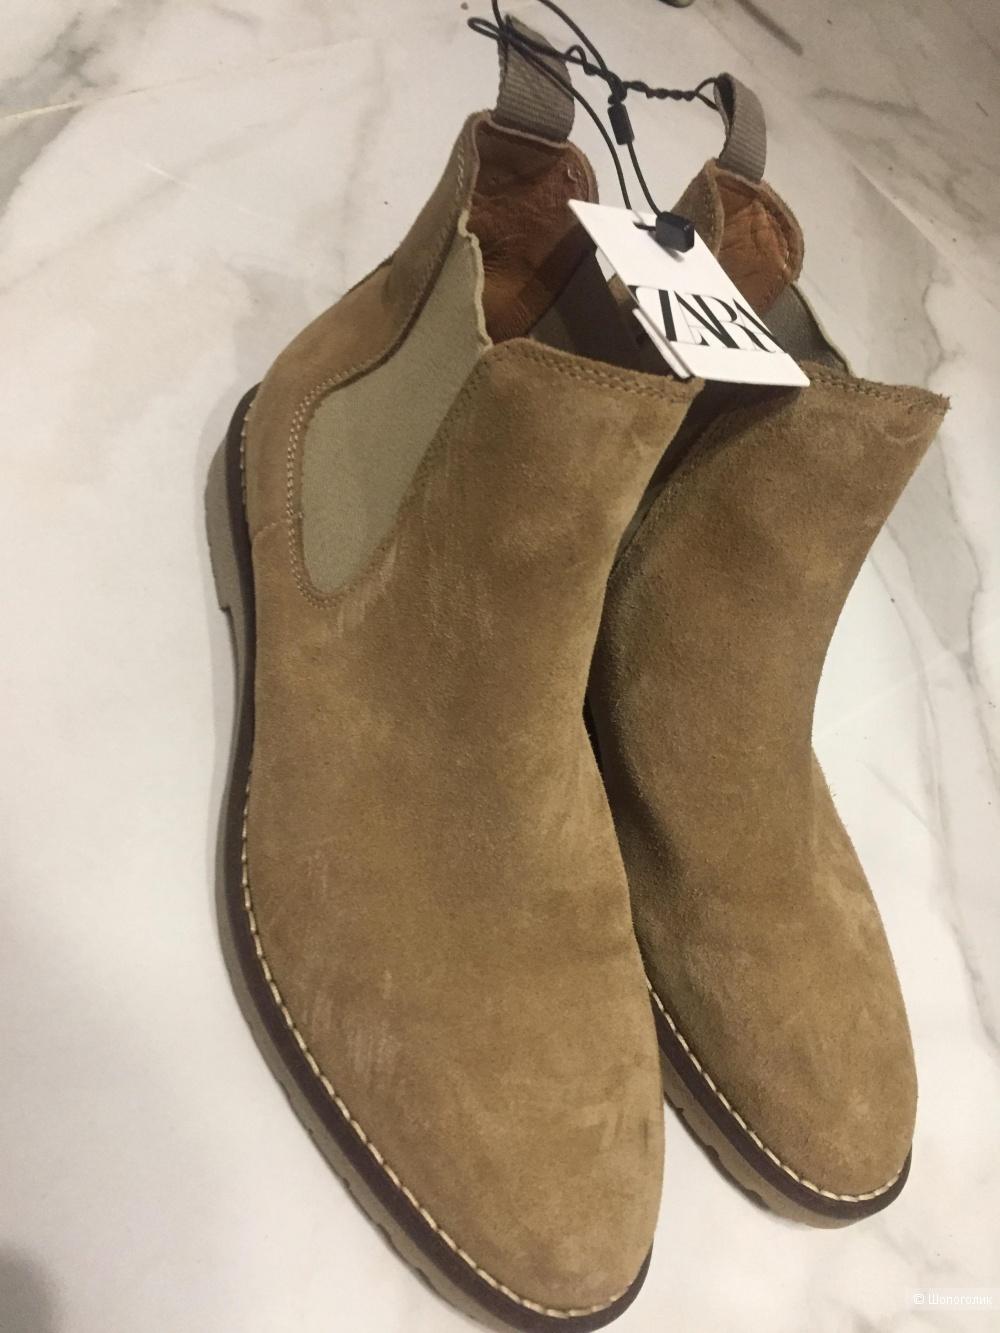 Zara ботинки-челси, размер 39